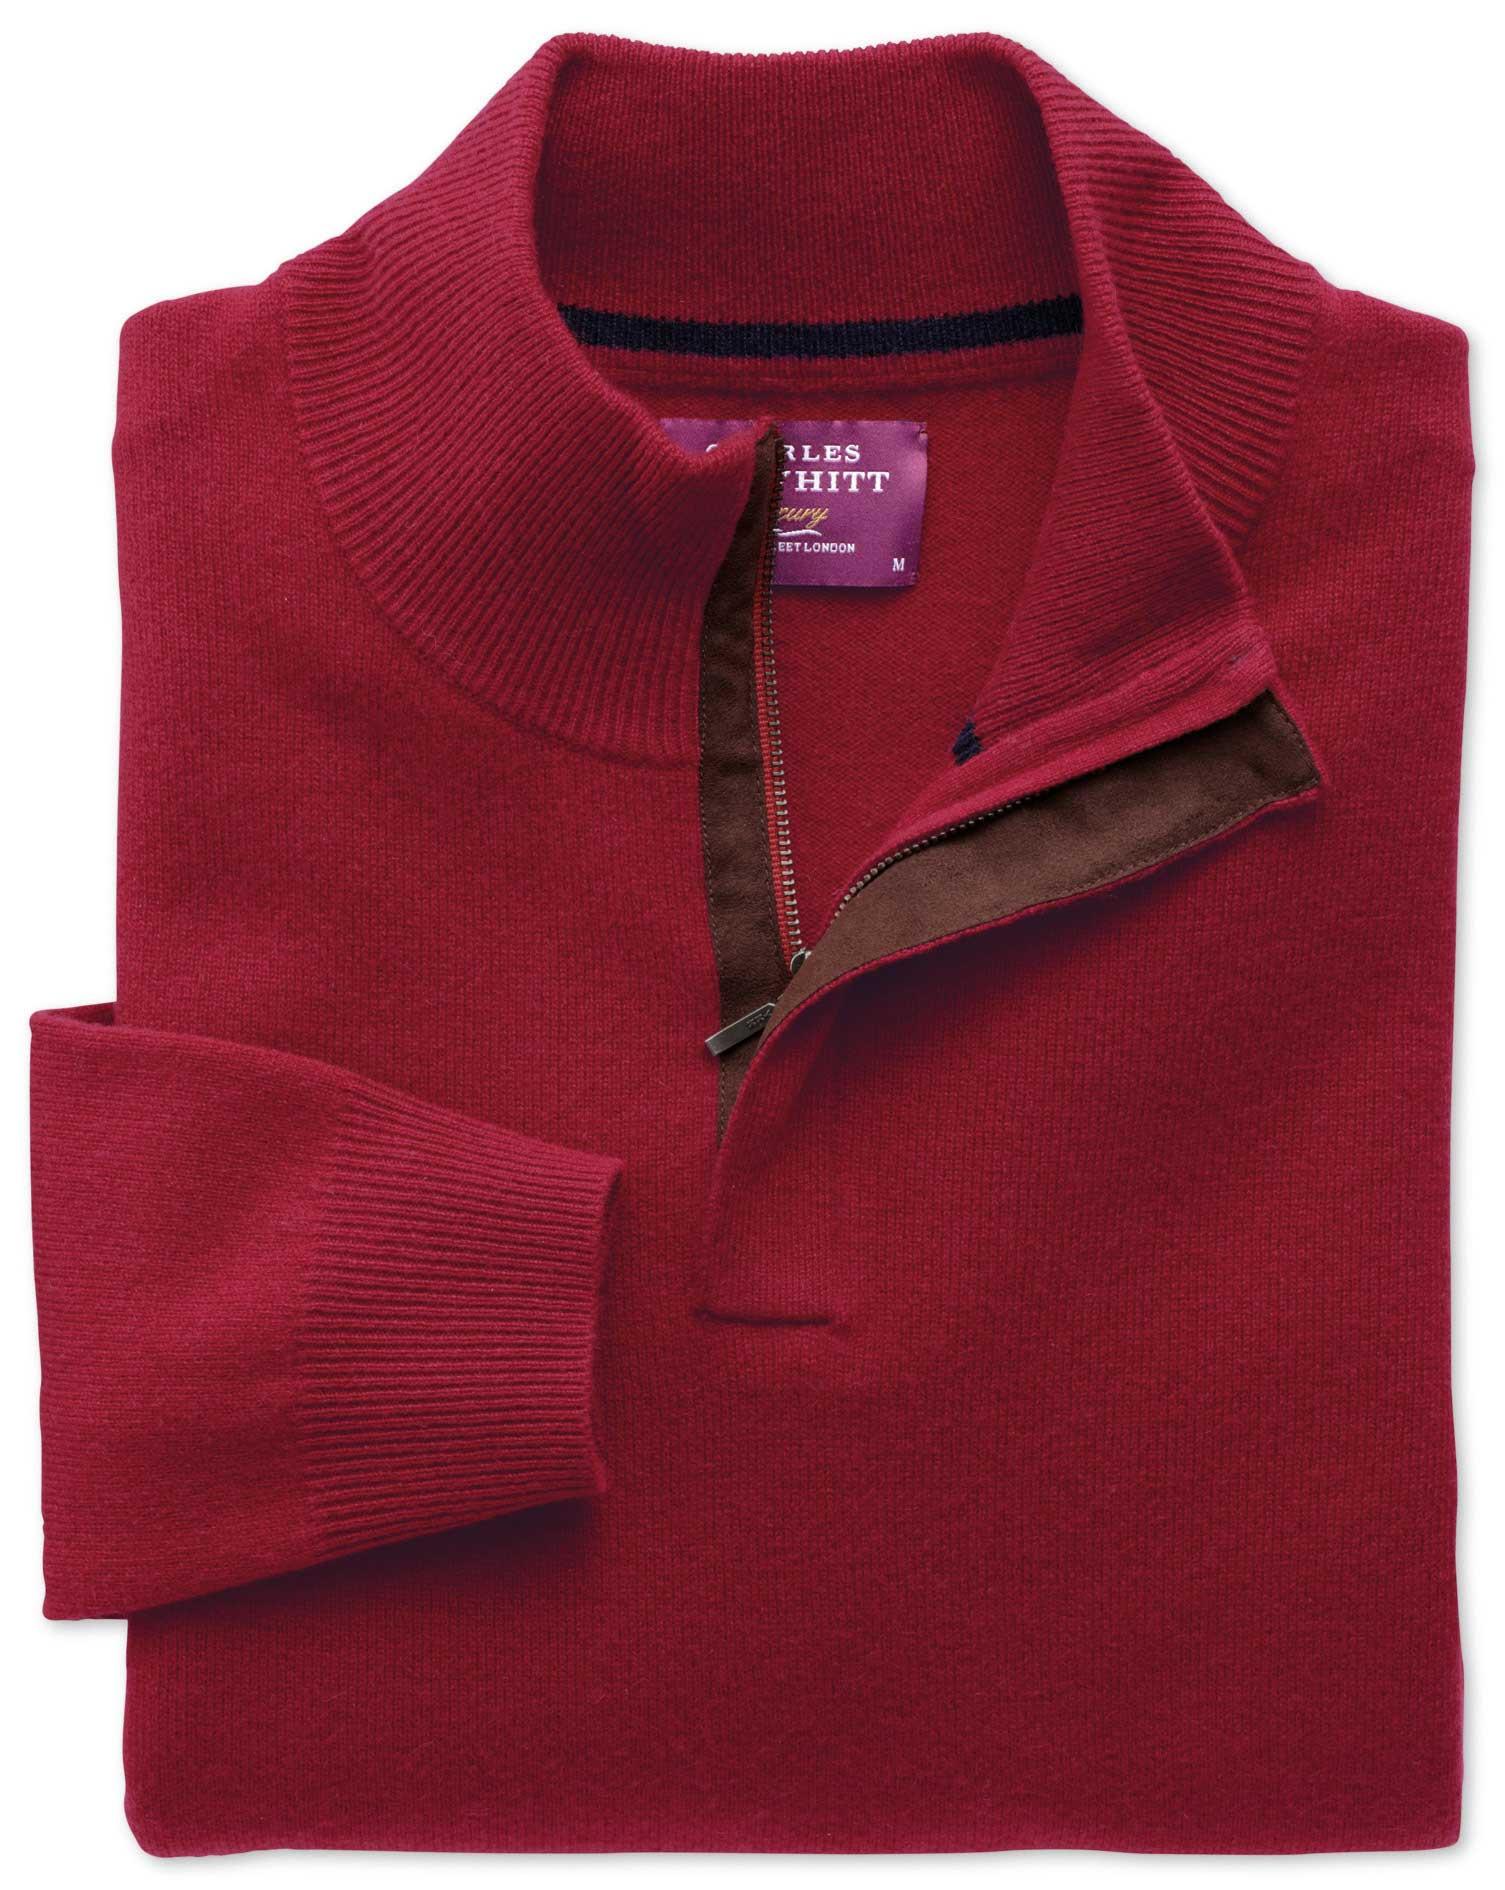 Red Cashmere Zip-Neck Jumper Size XXL by Charles Tyrwhitt